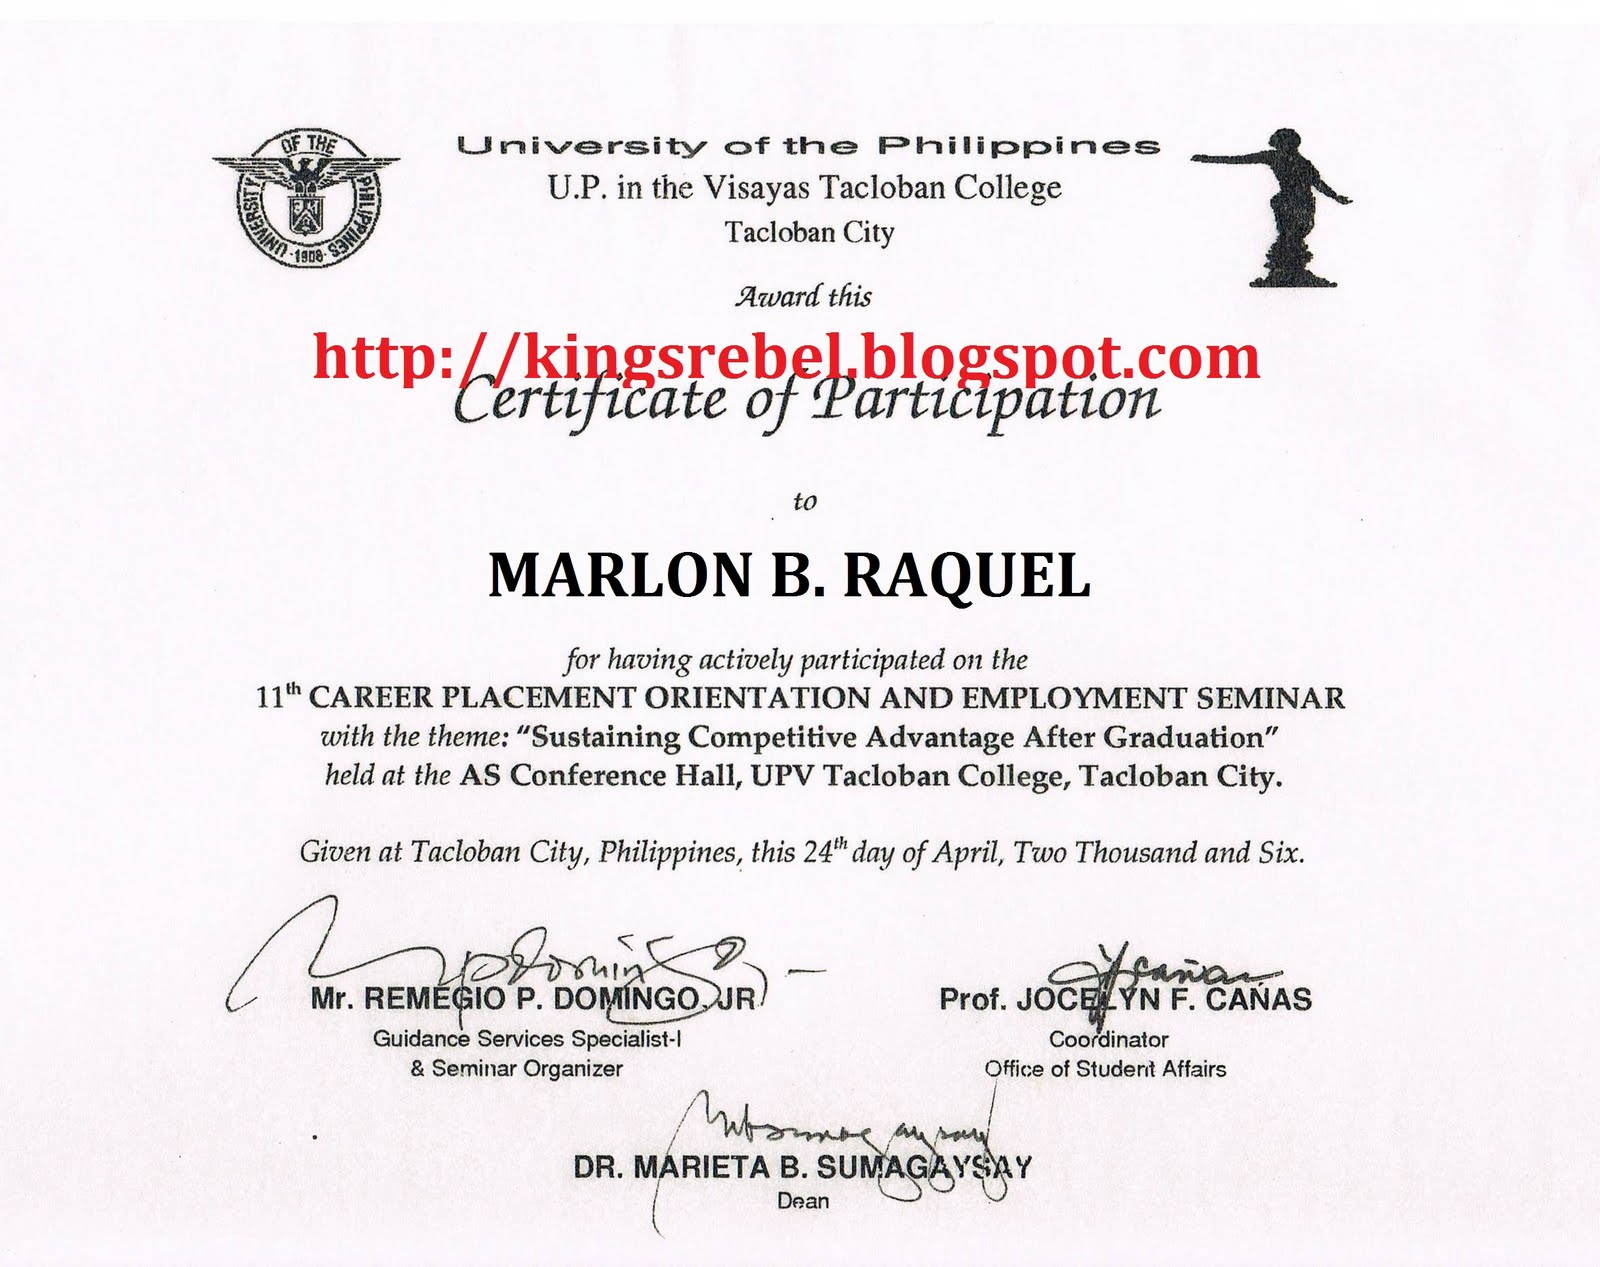 College_Certificates%20%286%29  Compliance Letter Template on sec 407 letter, duplicate statement 407 letter, rule 407 letter, blanket 407 letter,